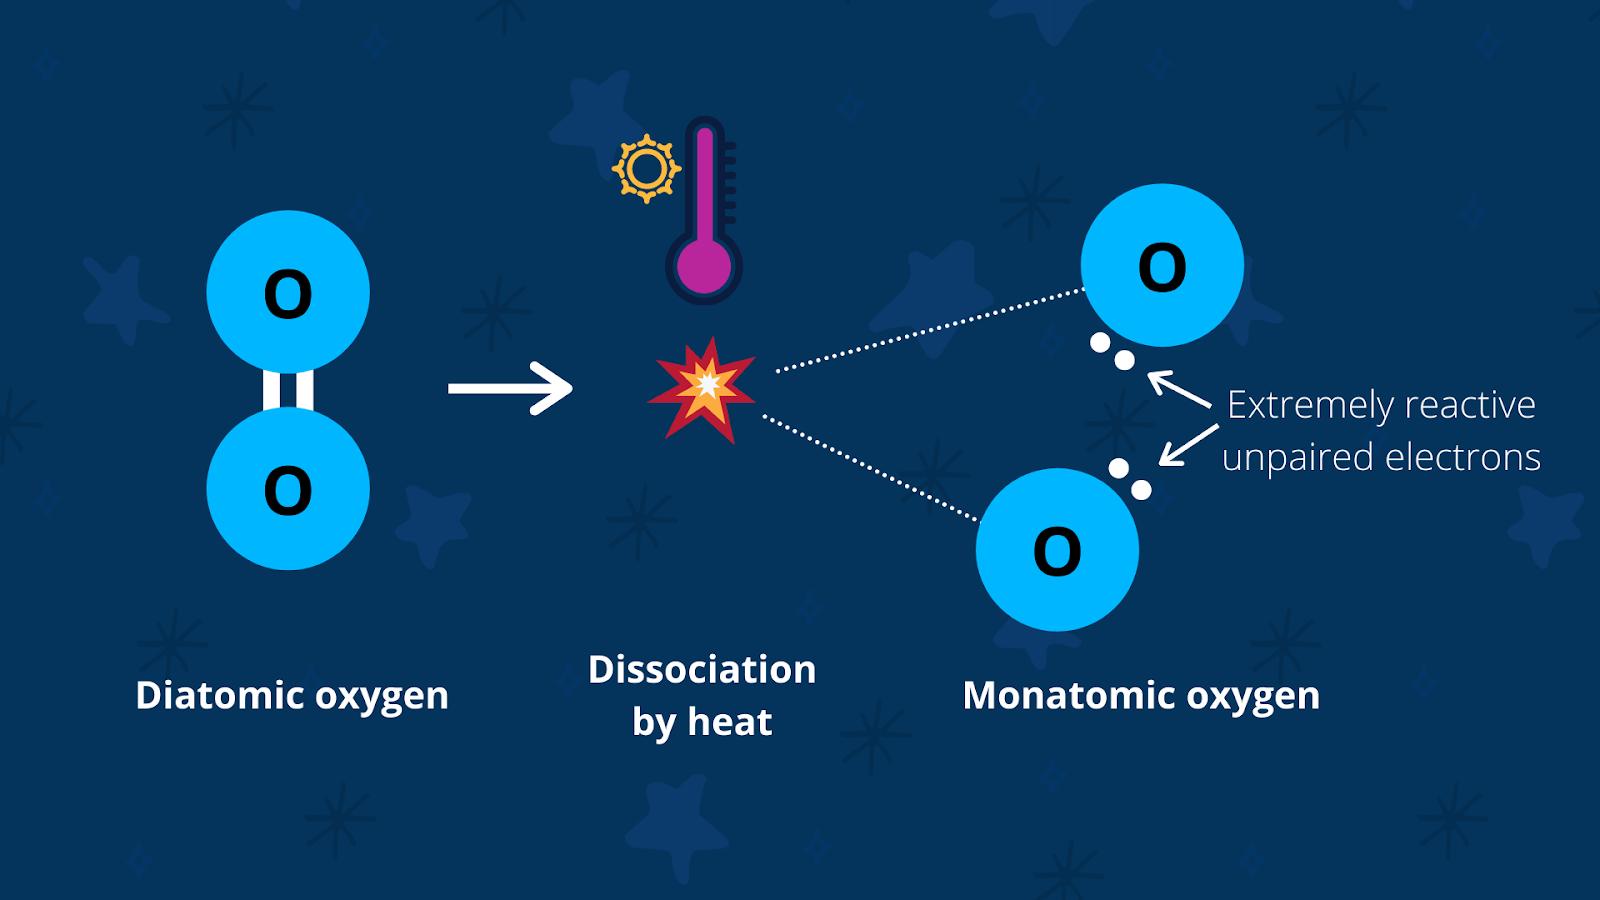 molecular dissociation